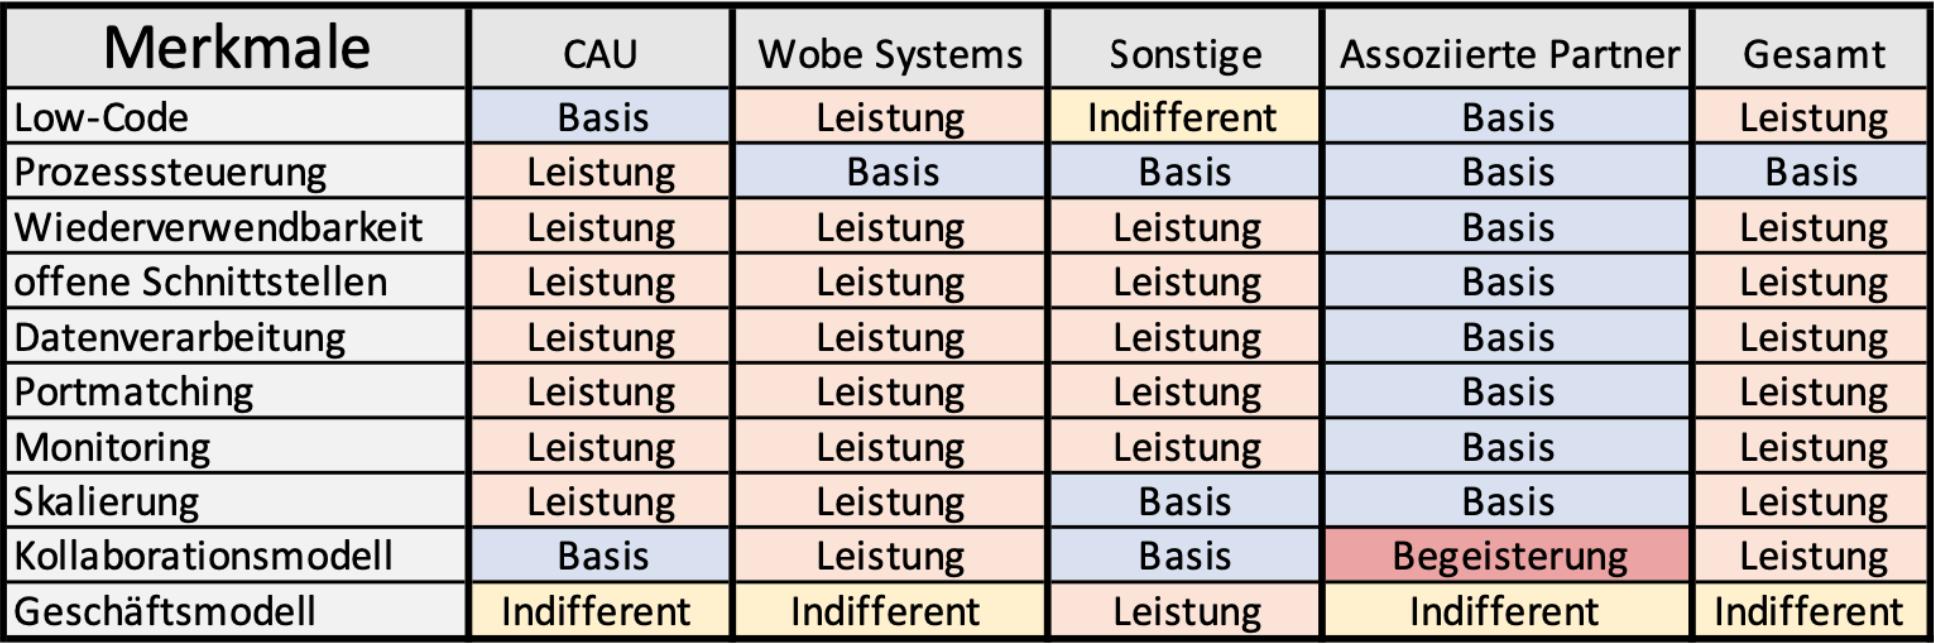 Analys nach Kano-Modell